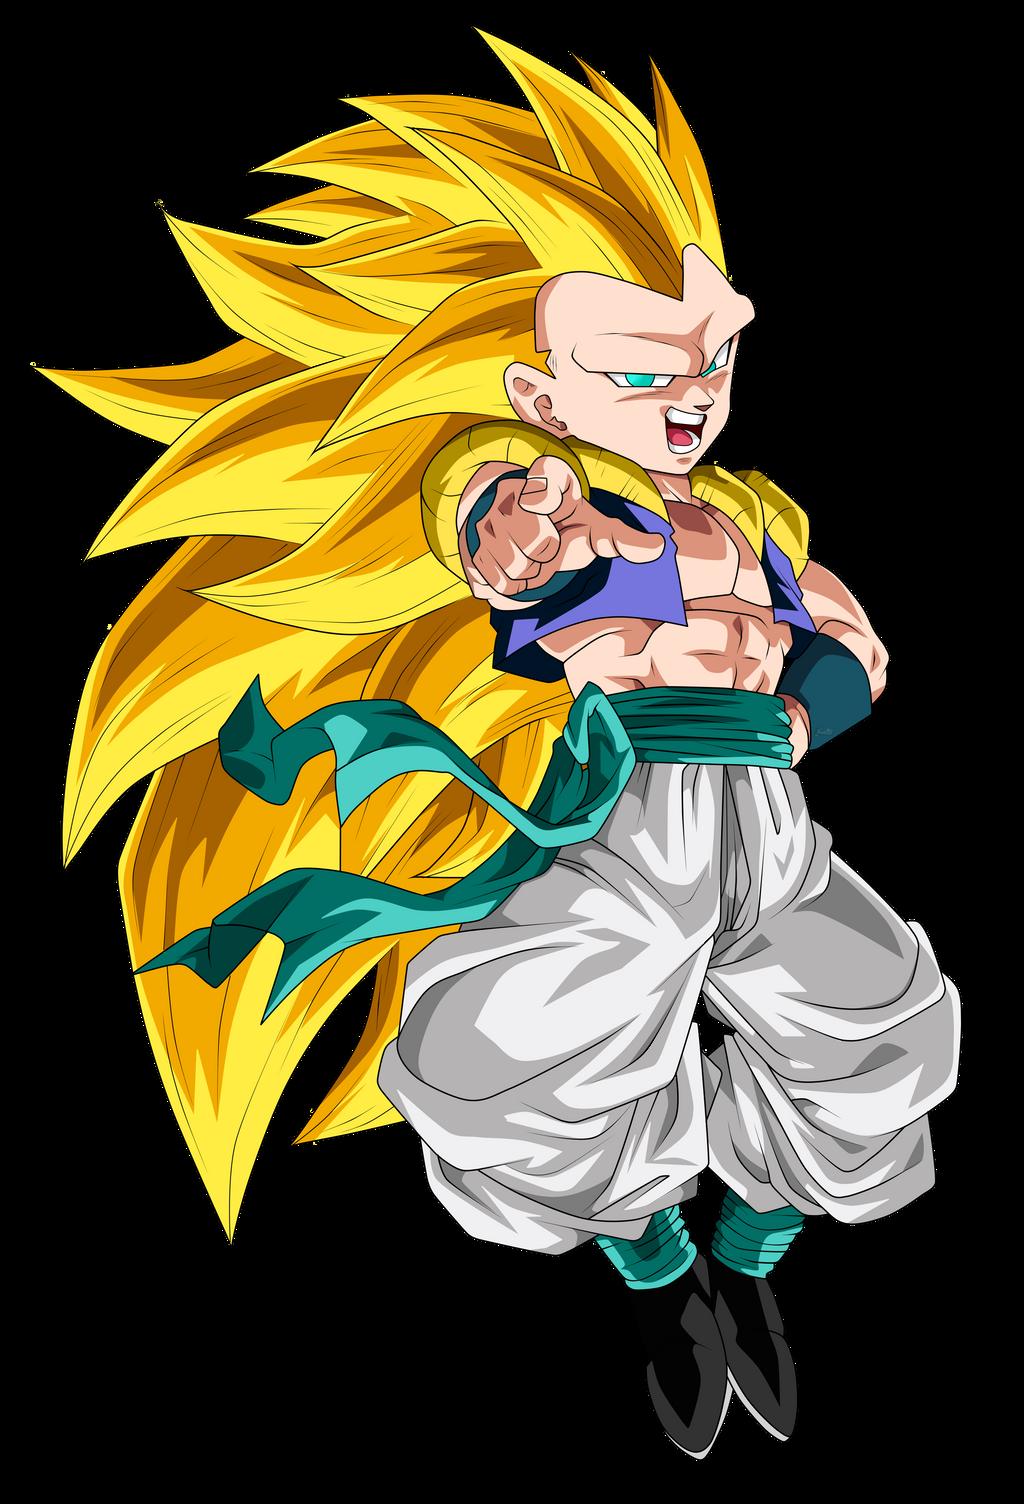 Gotenks Super Saiyan 3 by ChronoFz on DeviantArt